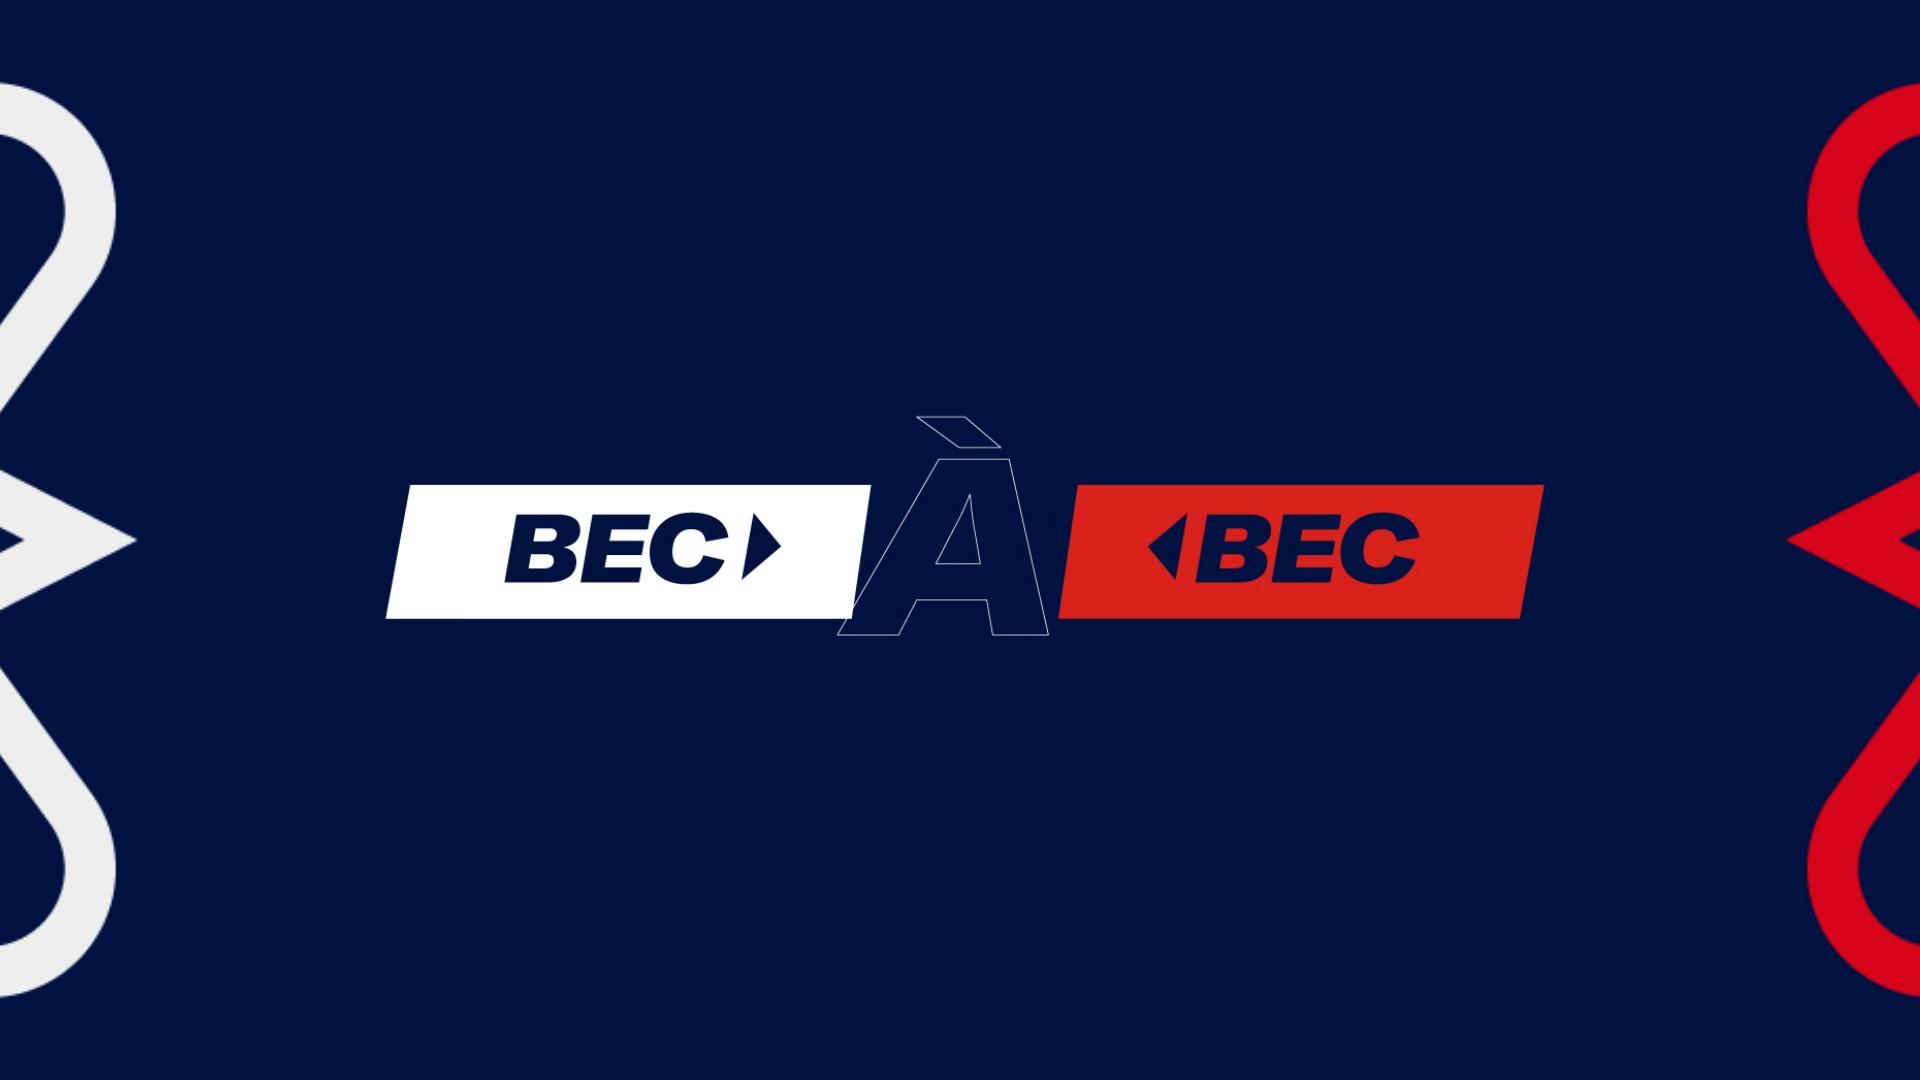 Bec à Bec – David Côté / Pierre-Luc Caron